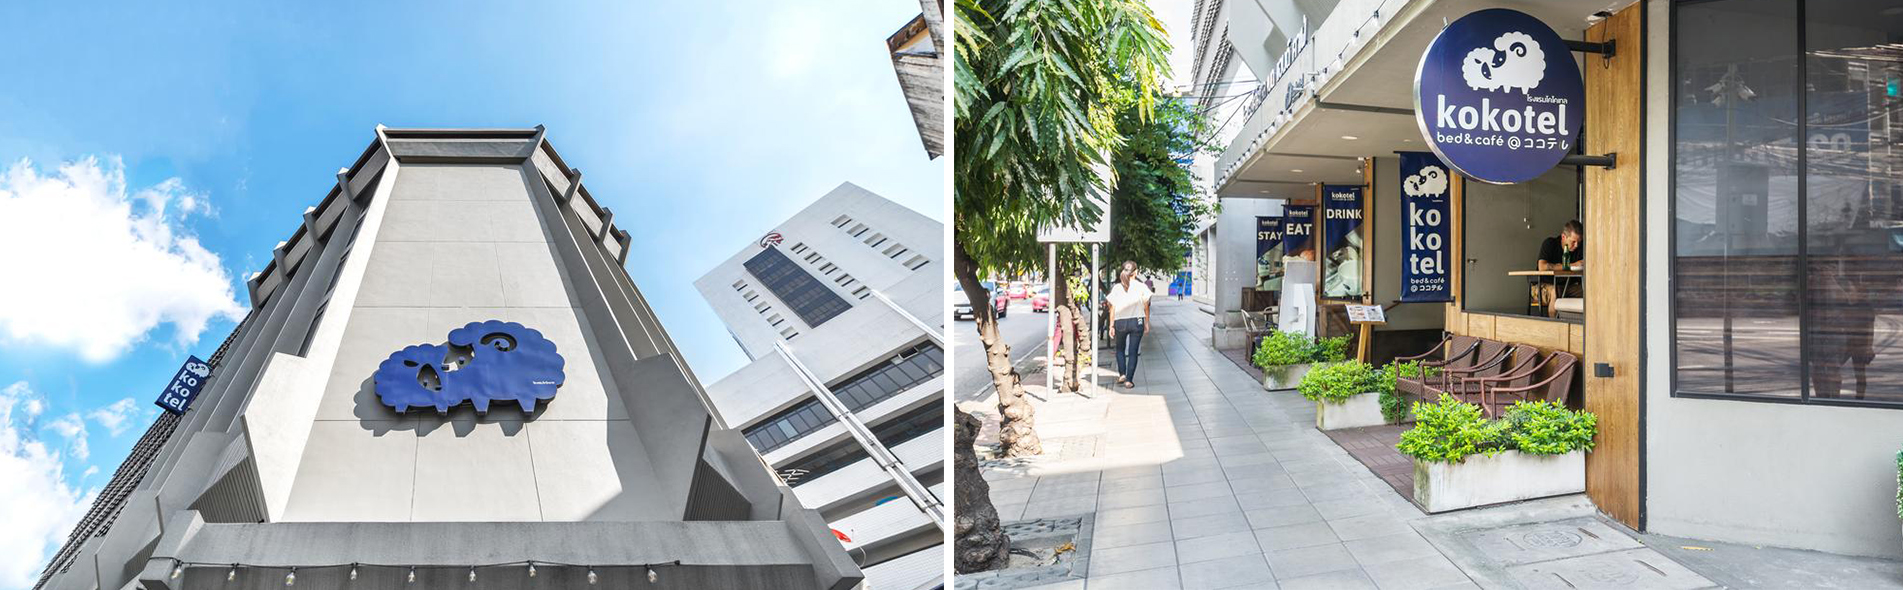 Kokotel Hotels, Bangkok, Thailand